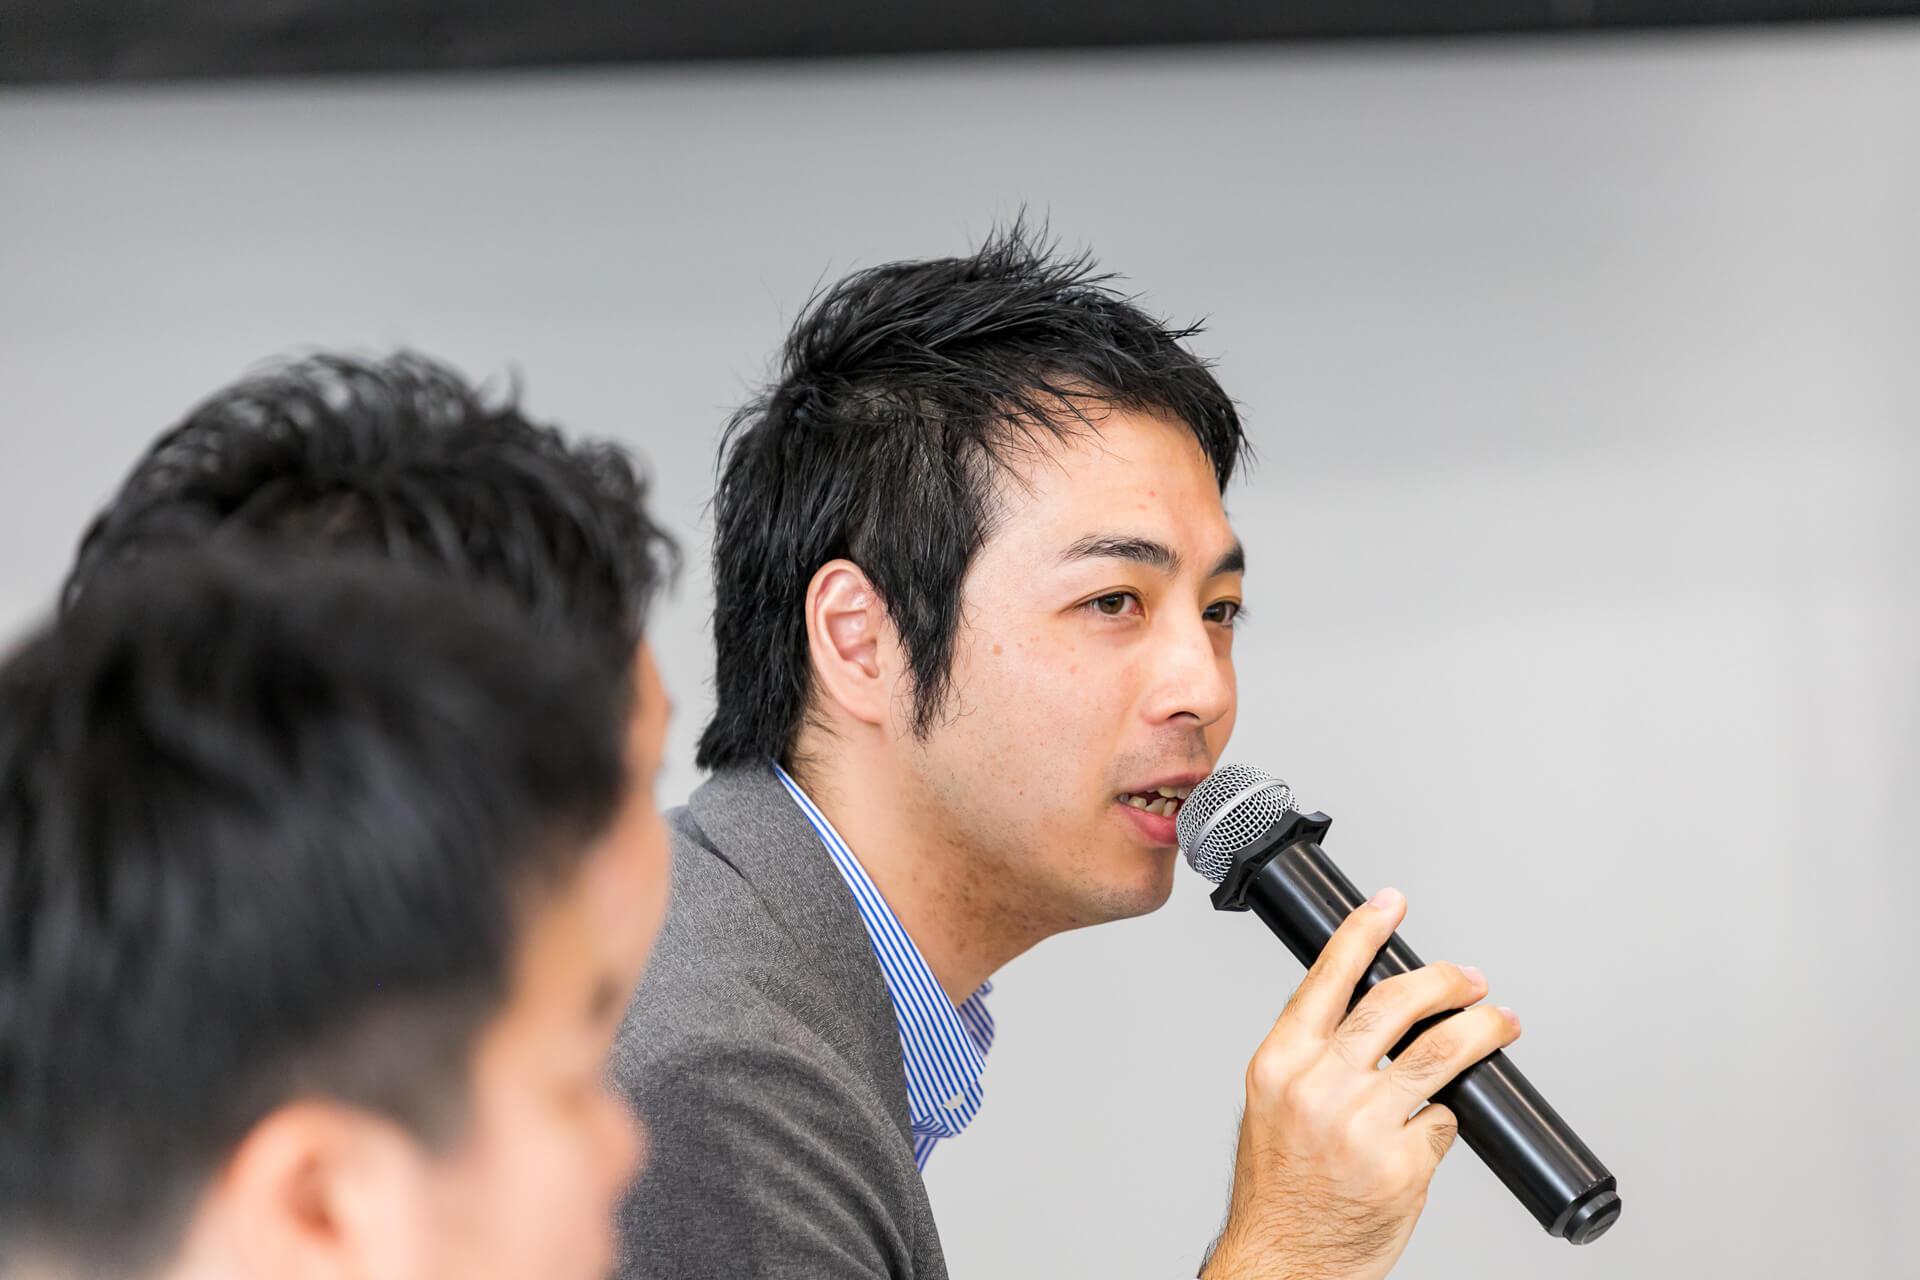 中島亮介氏 株式会社経営共創基盤(IGPI)マネジャー/公認会計士